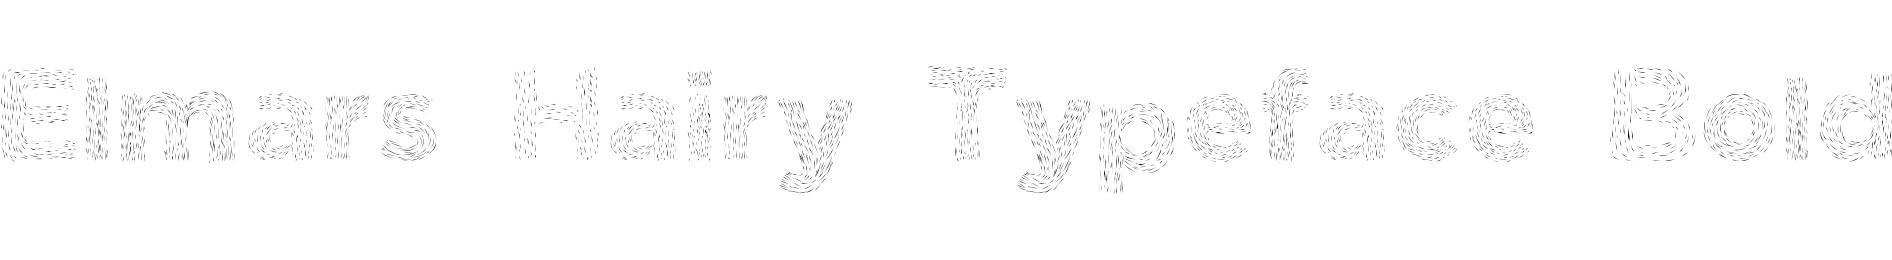 Elmars Hairy Typeface Bold